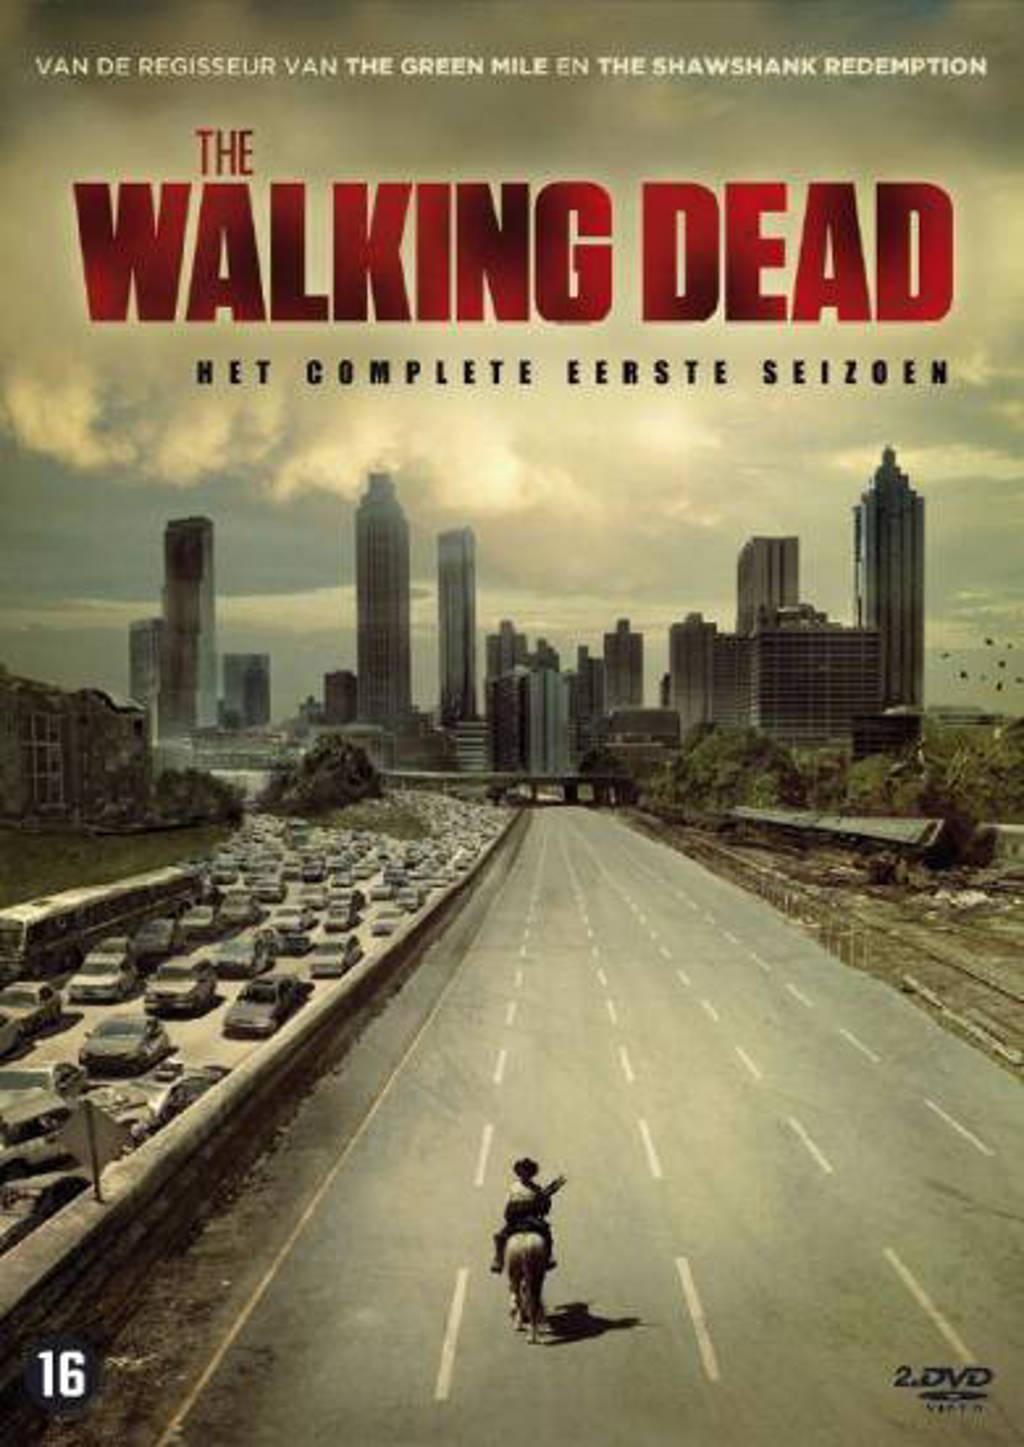 The walking dead - Seizoen 1 (DVD)